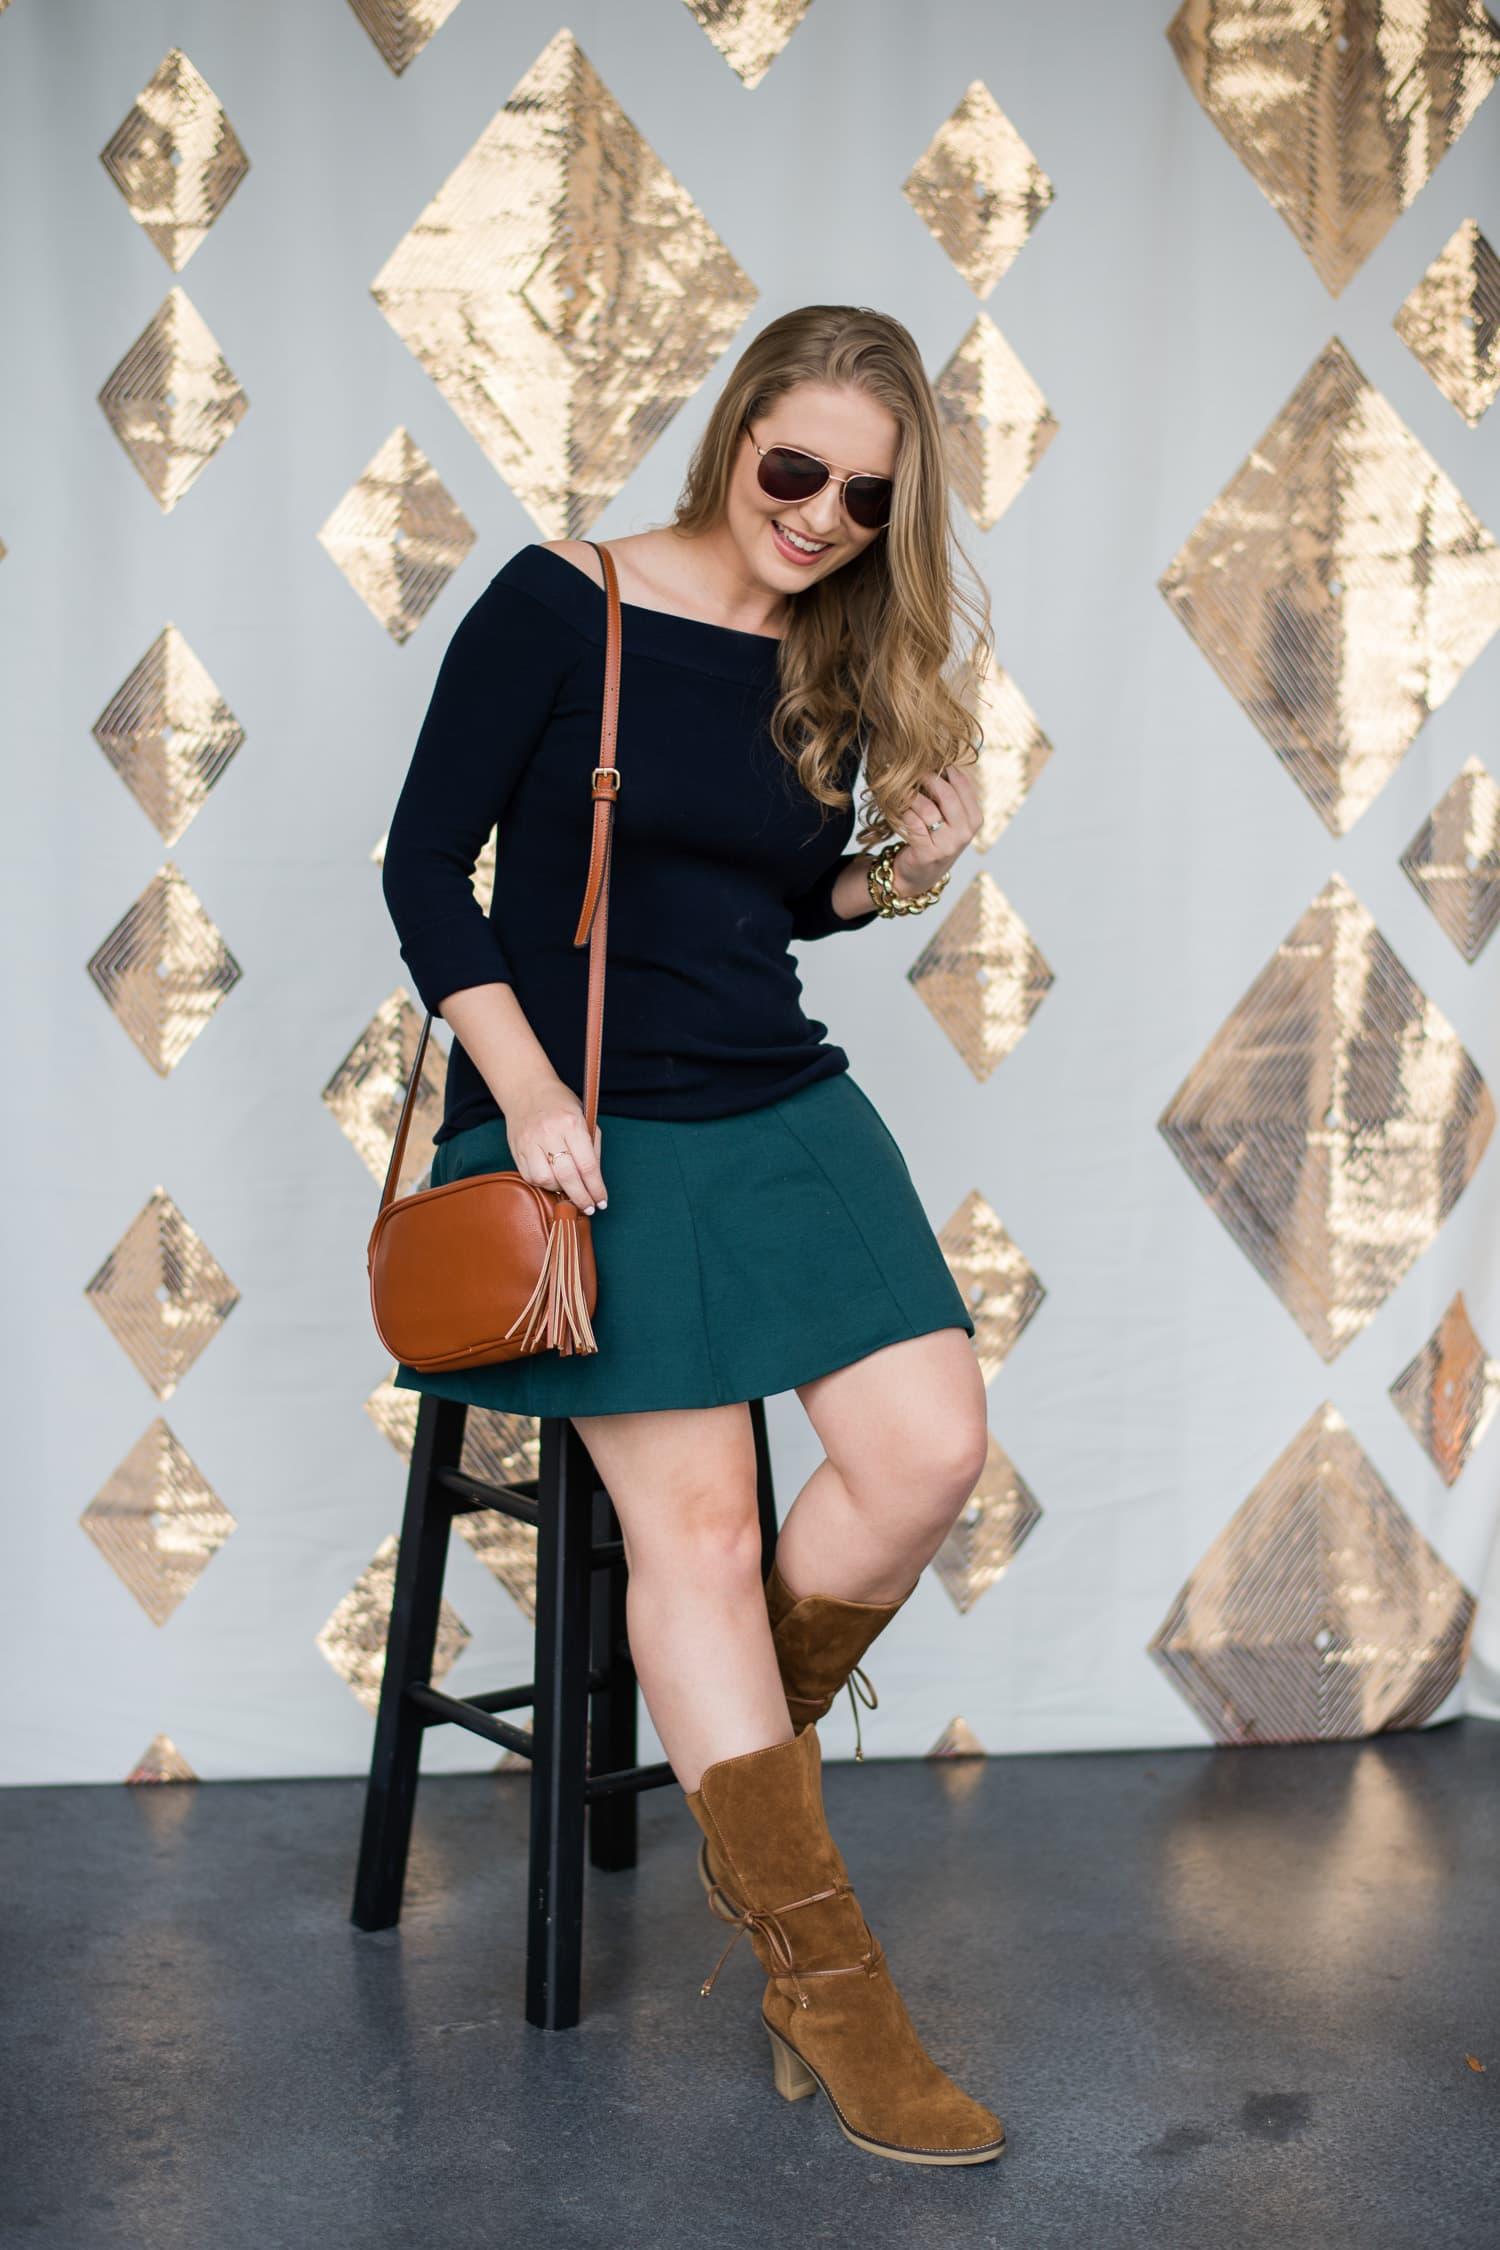 brown-suede-boots-tassel-handbag-rose-gold-aviator-sunglasses-foster-grant-3302-2